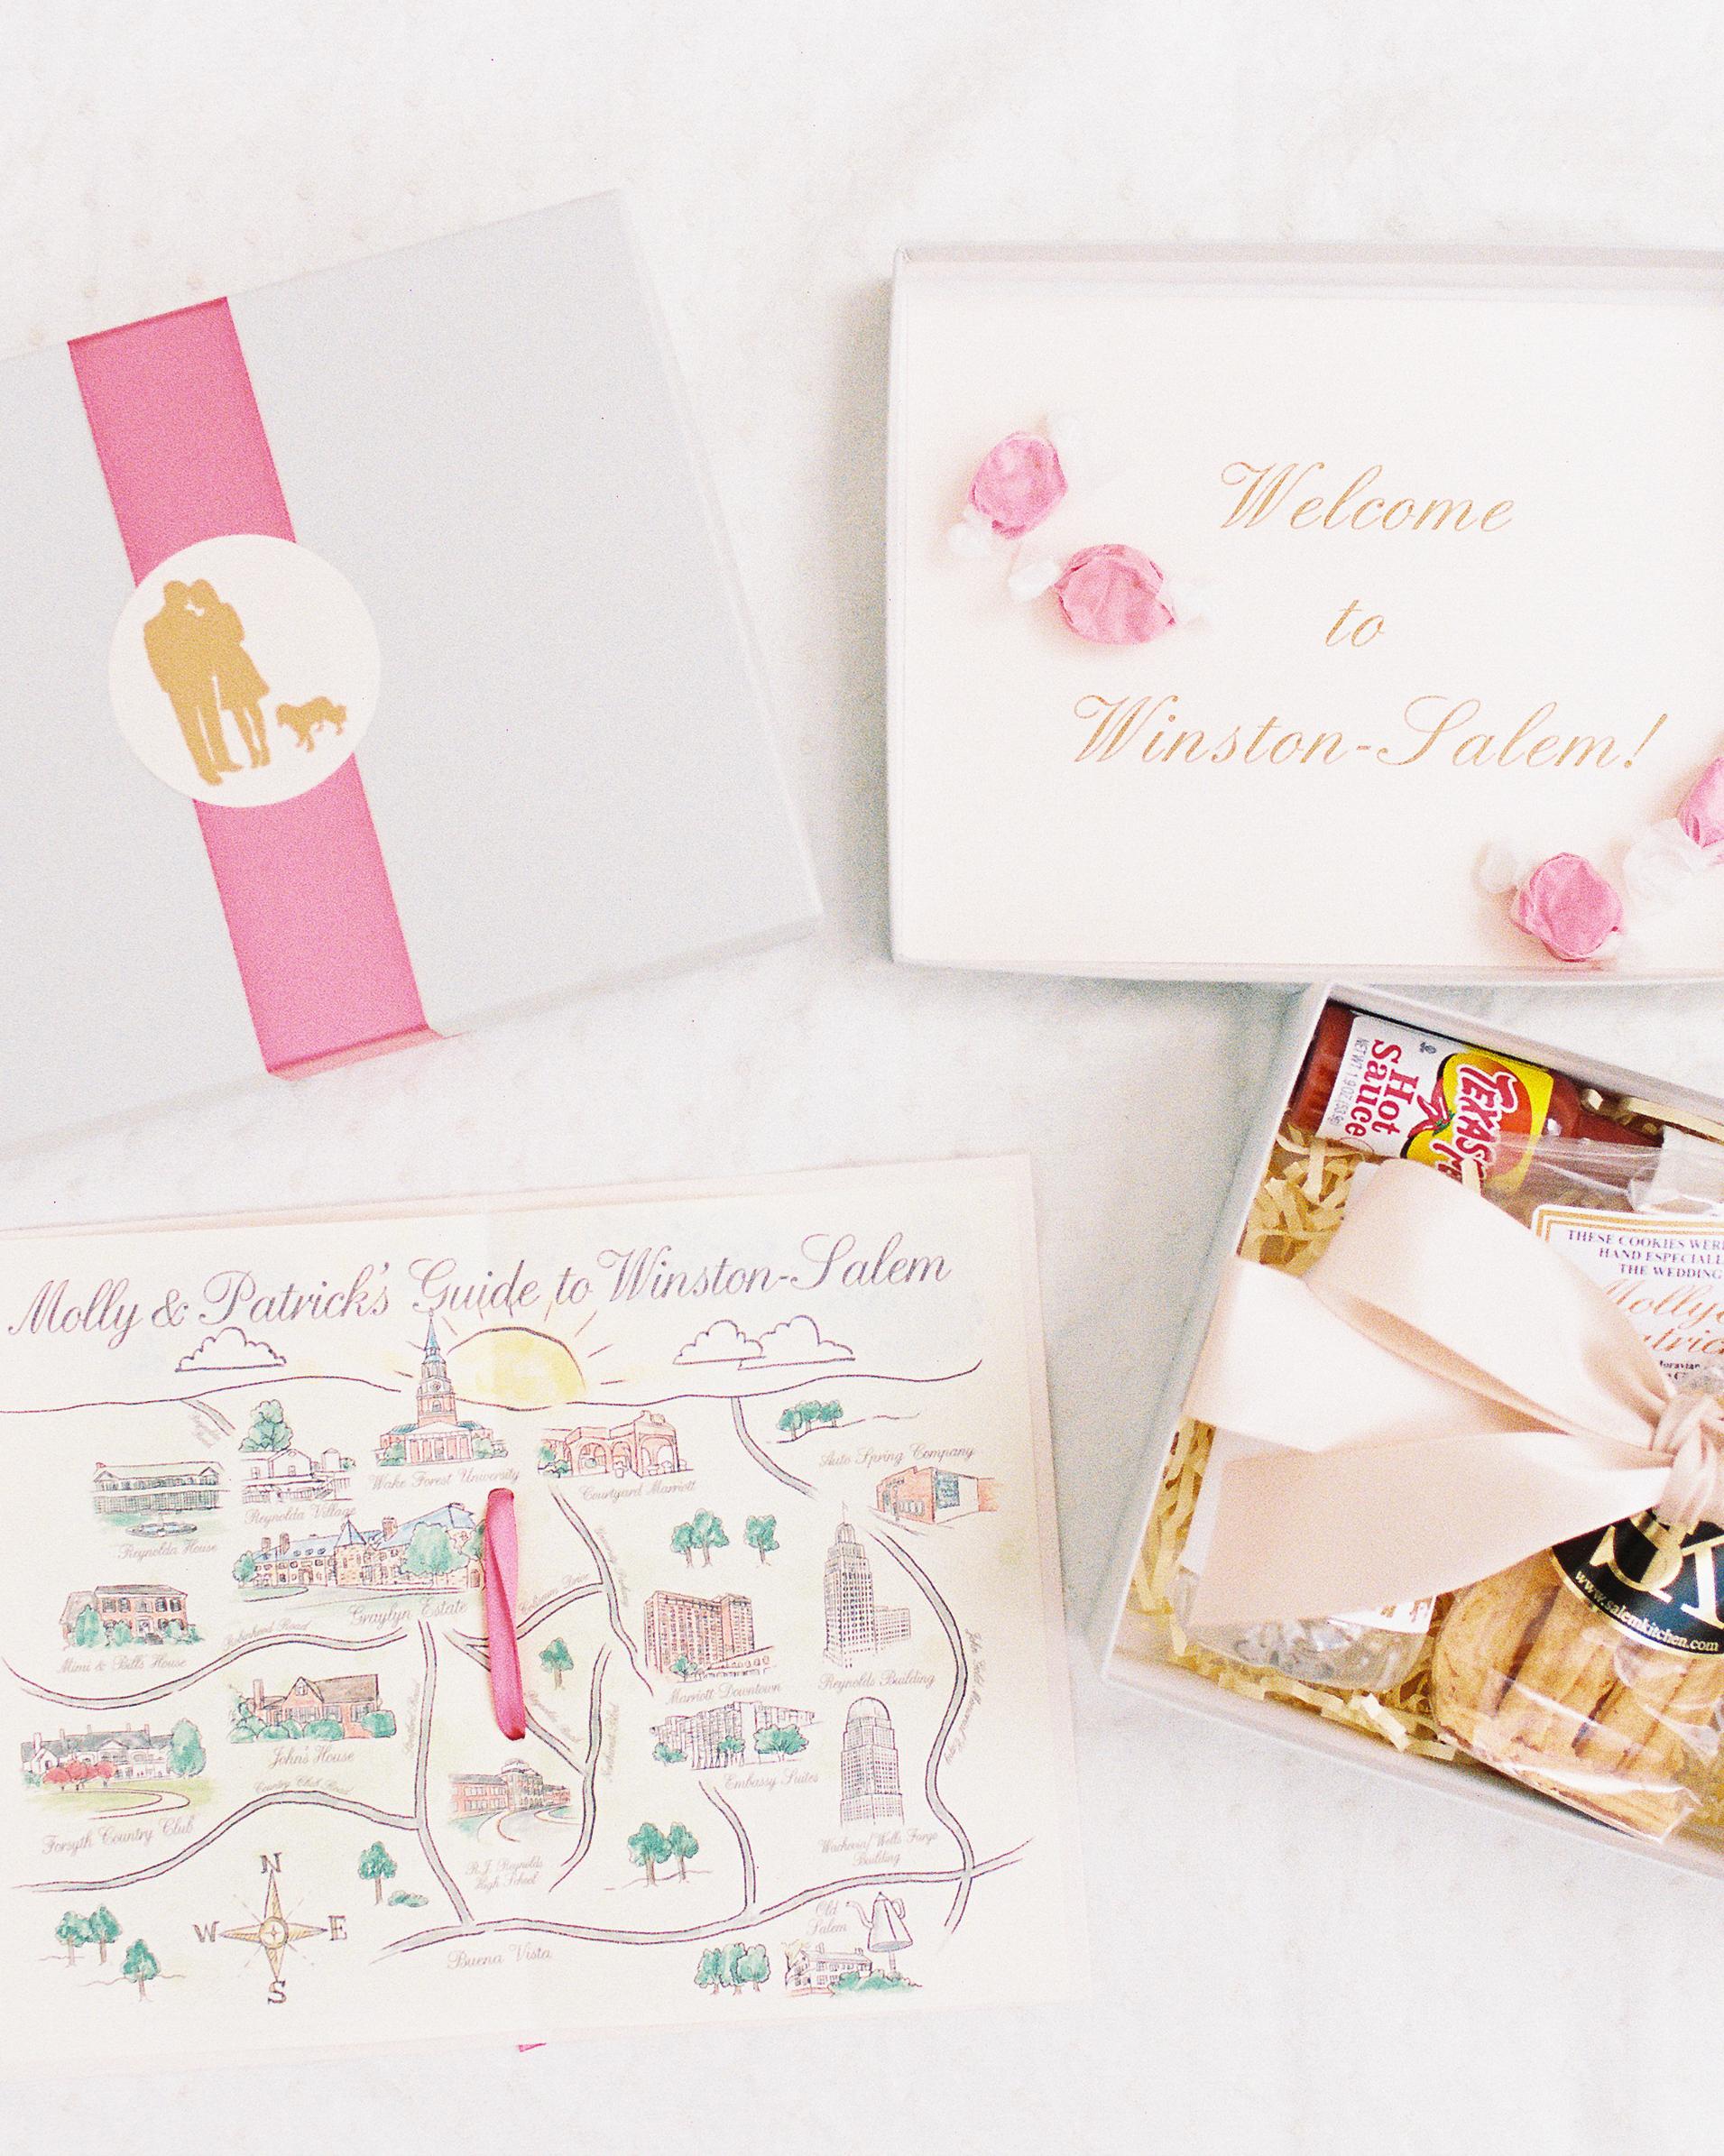 molly-patrick-wedding-welcomebox-3075-s111760-0115.jpg